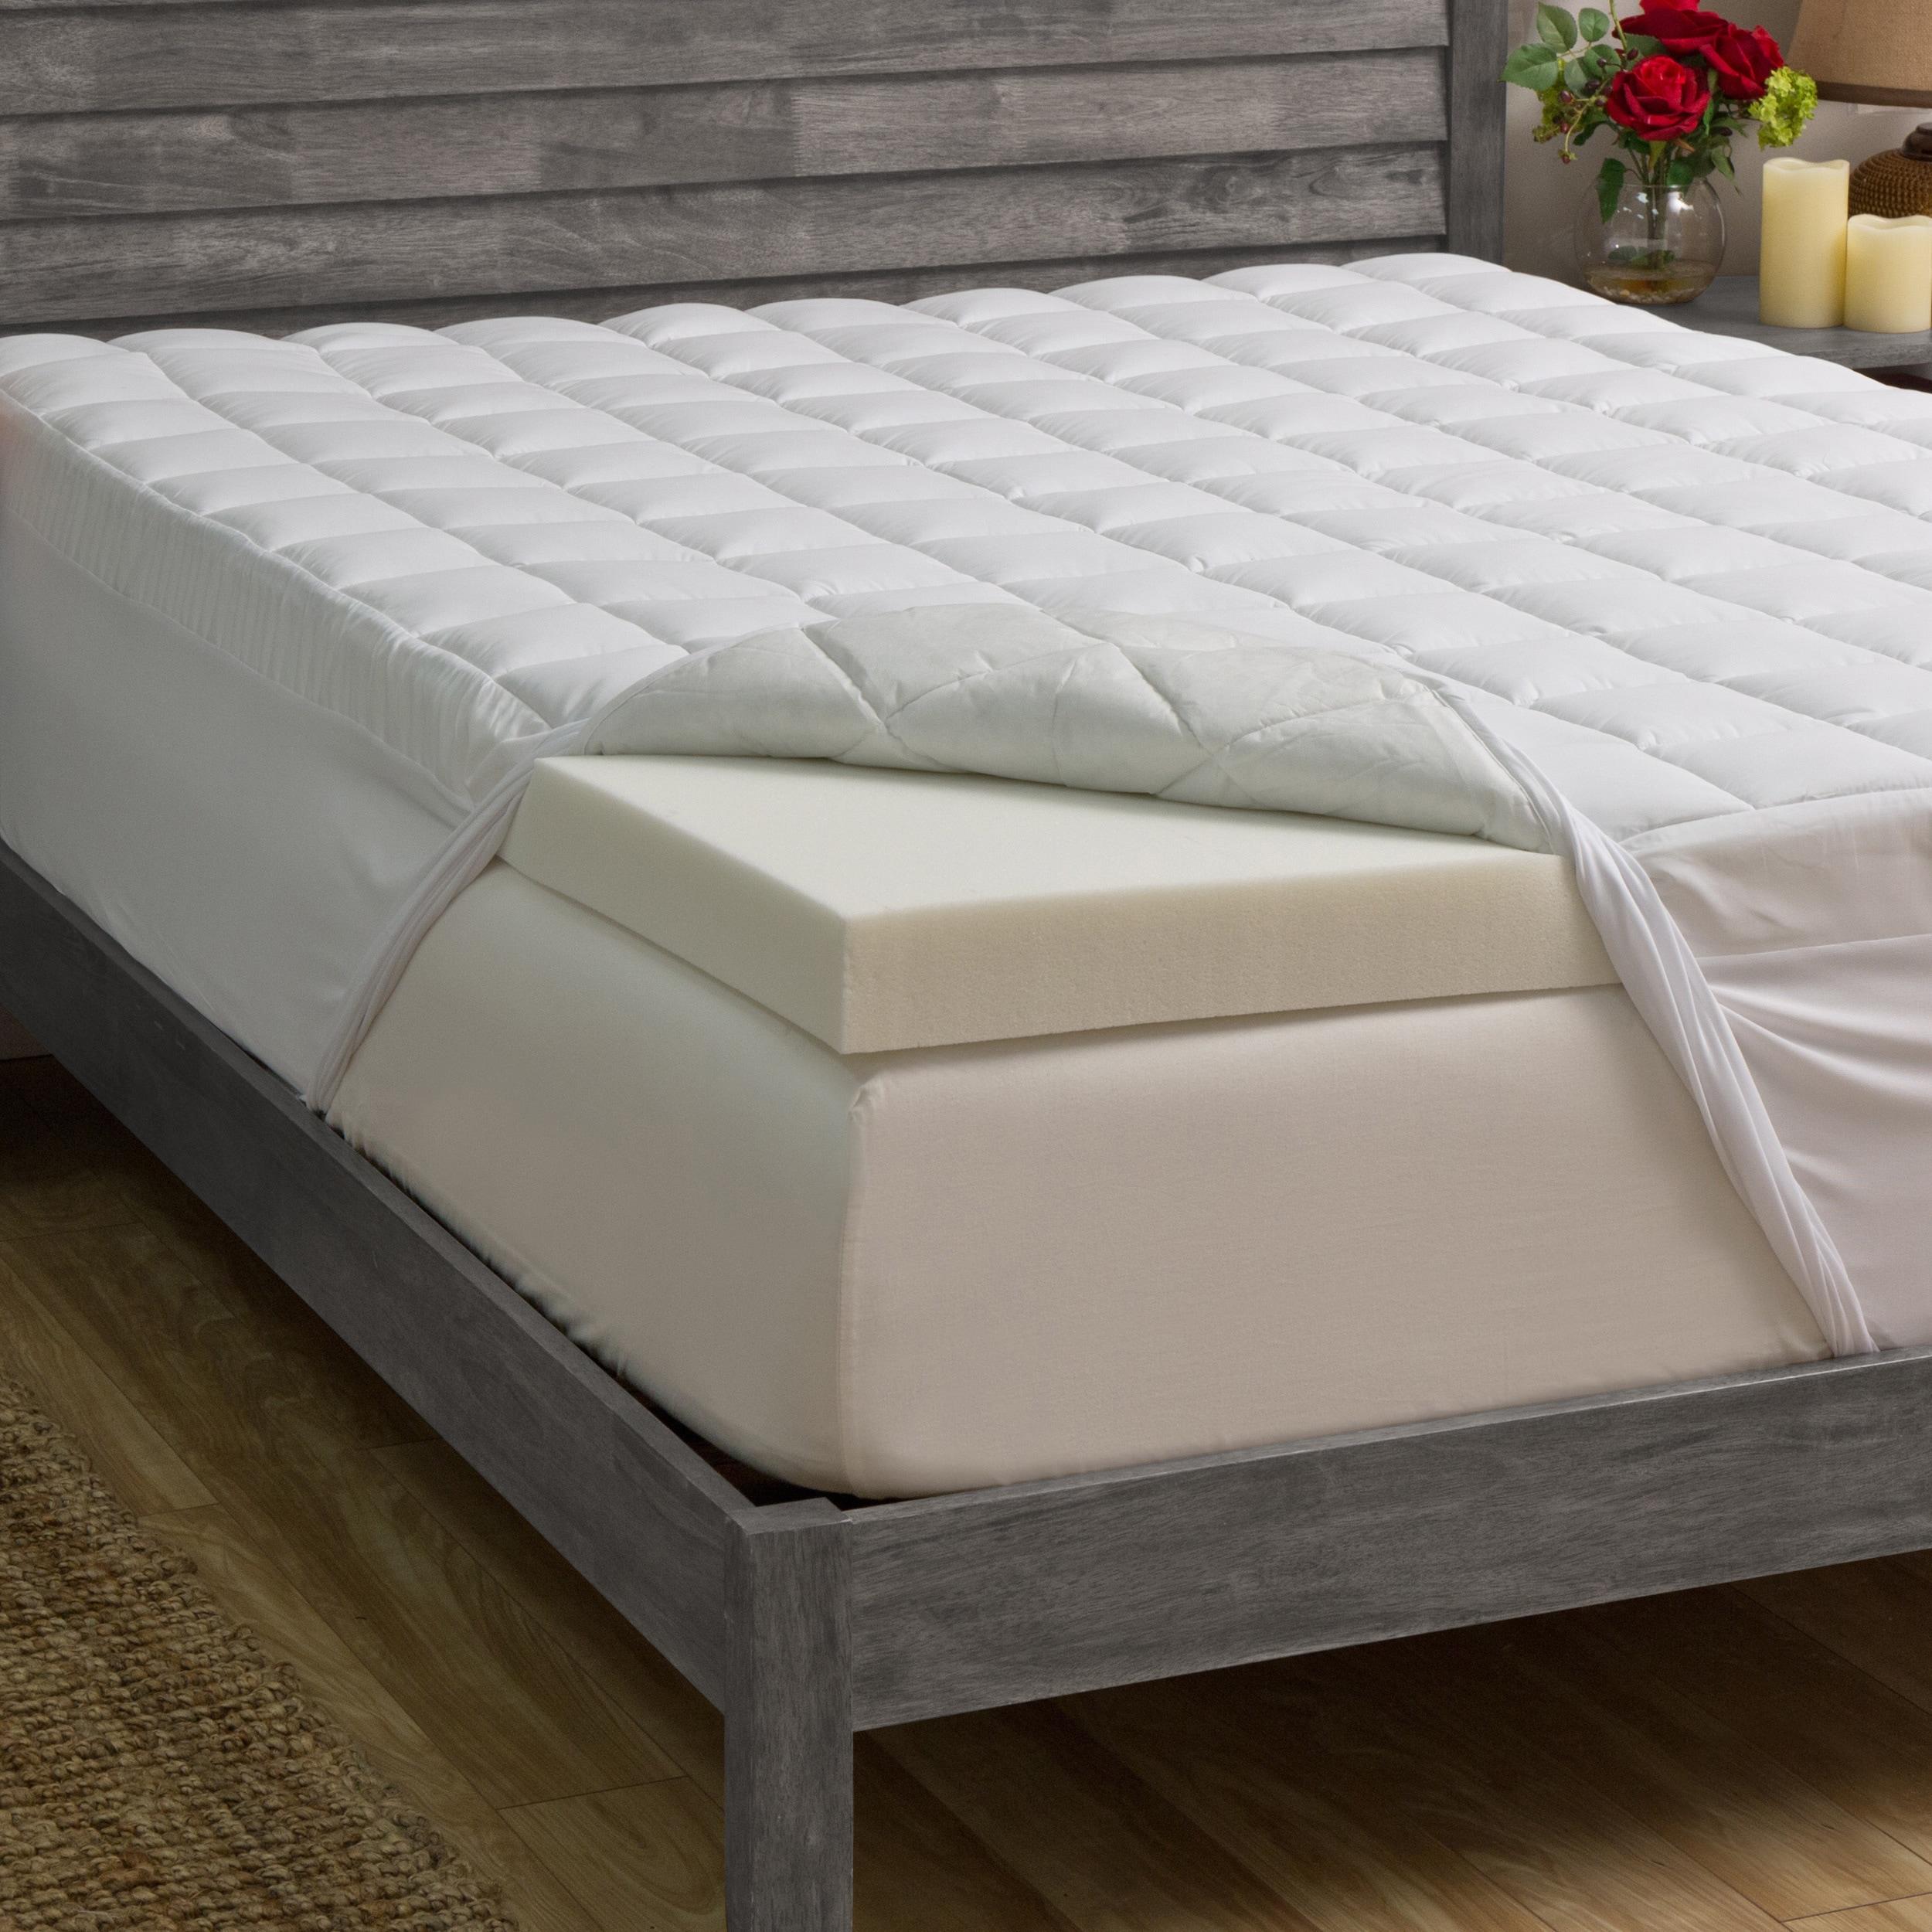 inch foam full mattress comfortable for sleep topper home memory